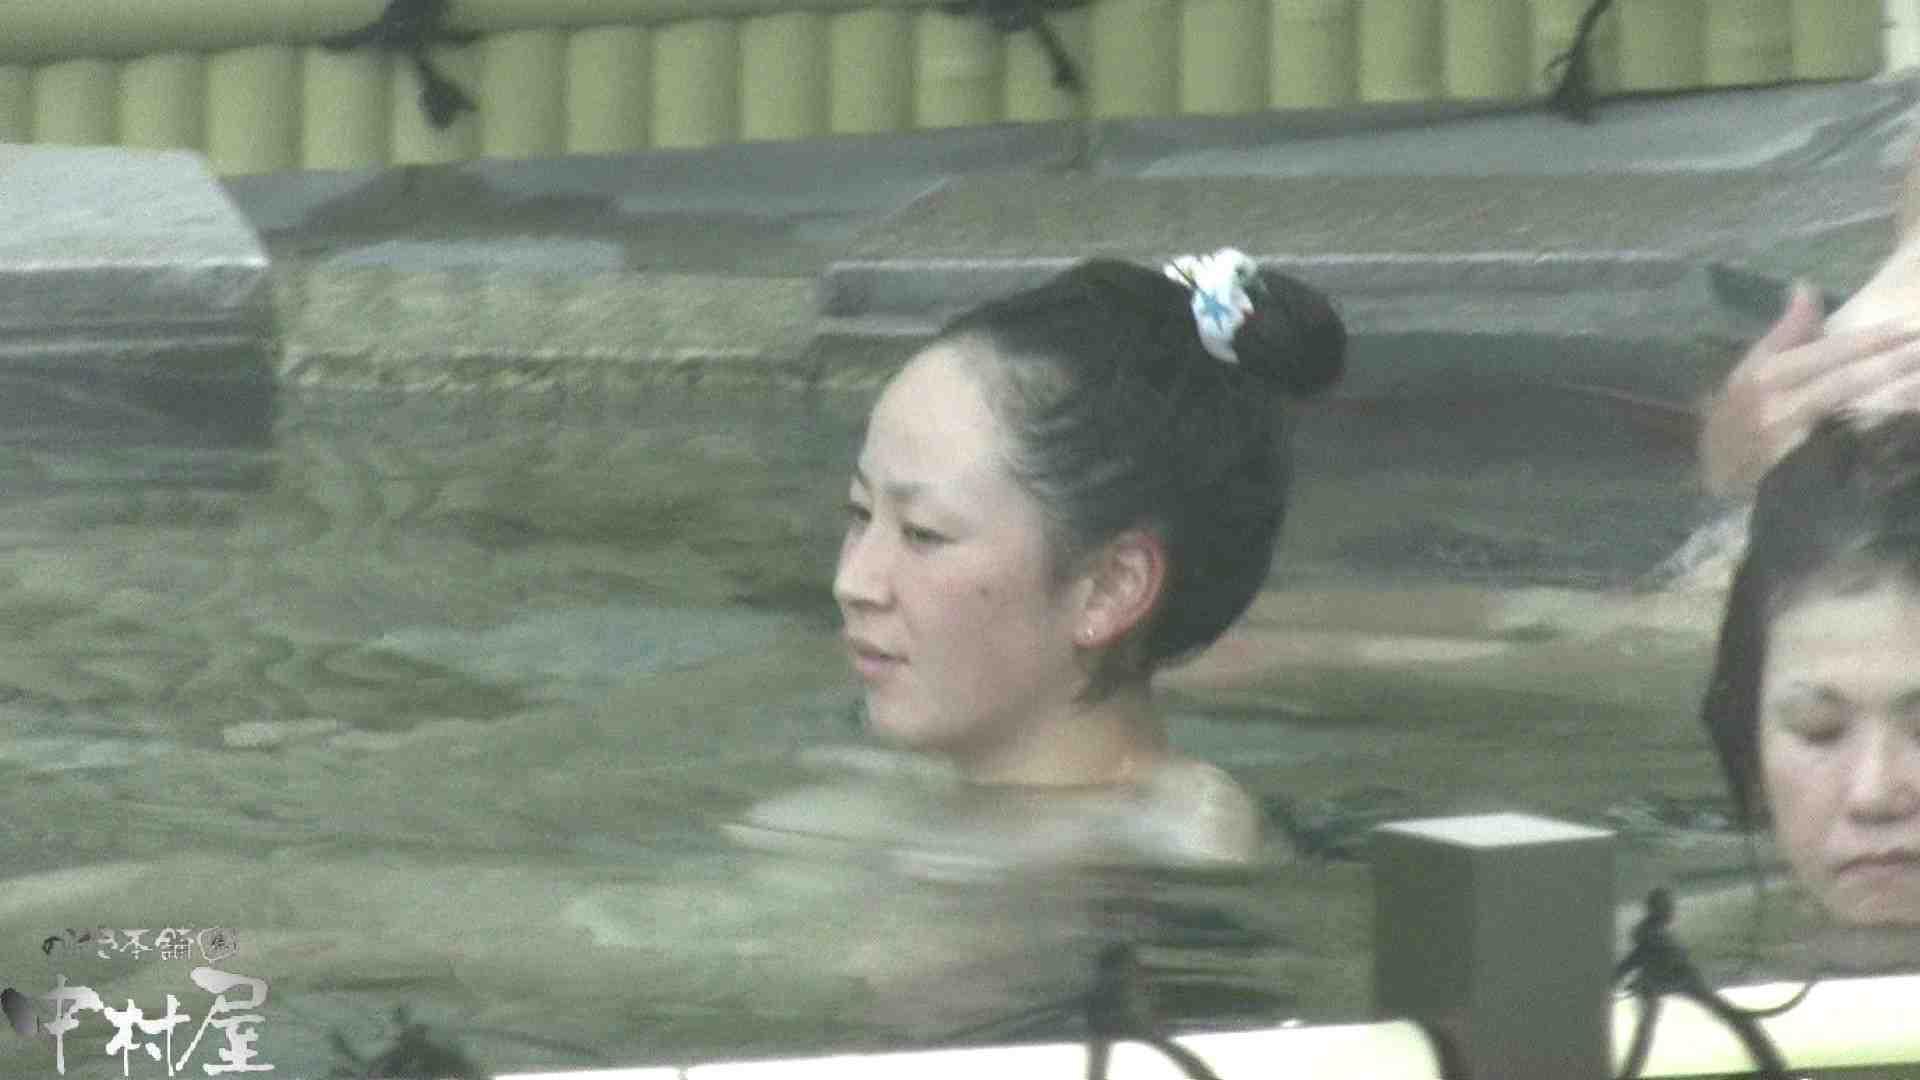 Aquaな露天風呂Vol.911 0  88連発 14